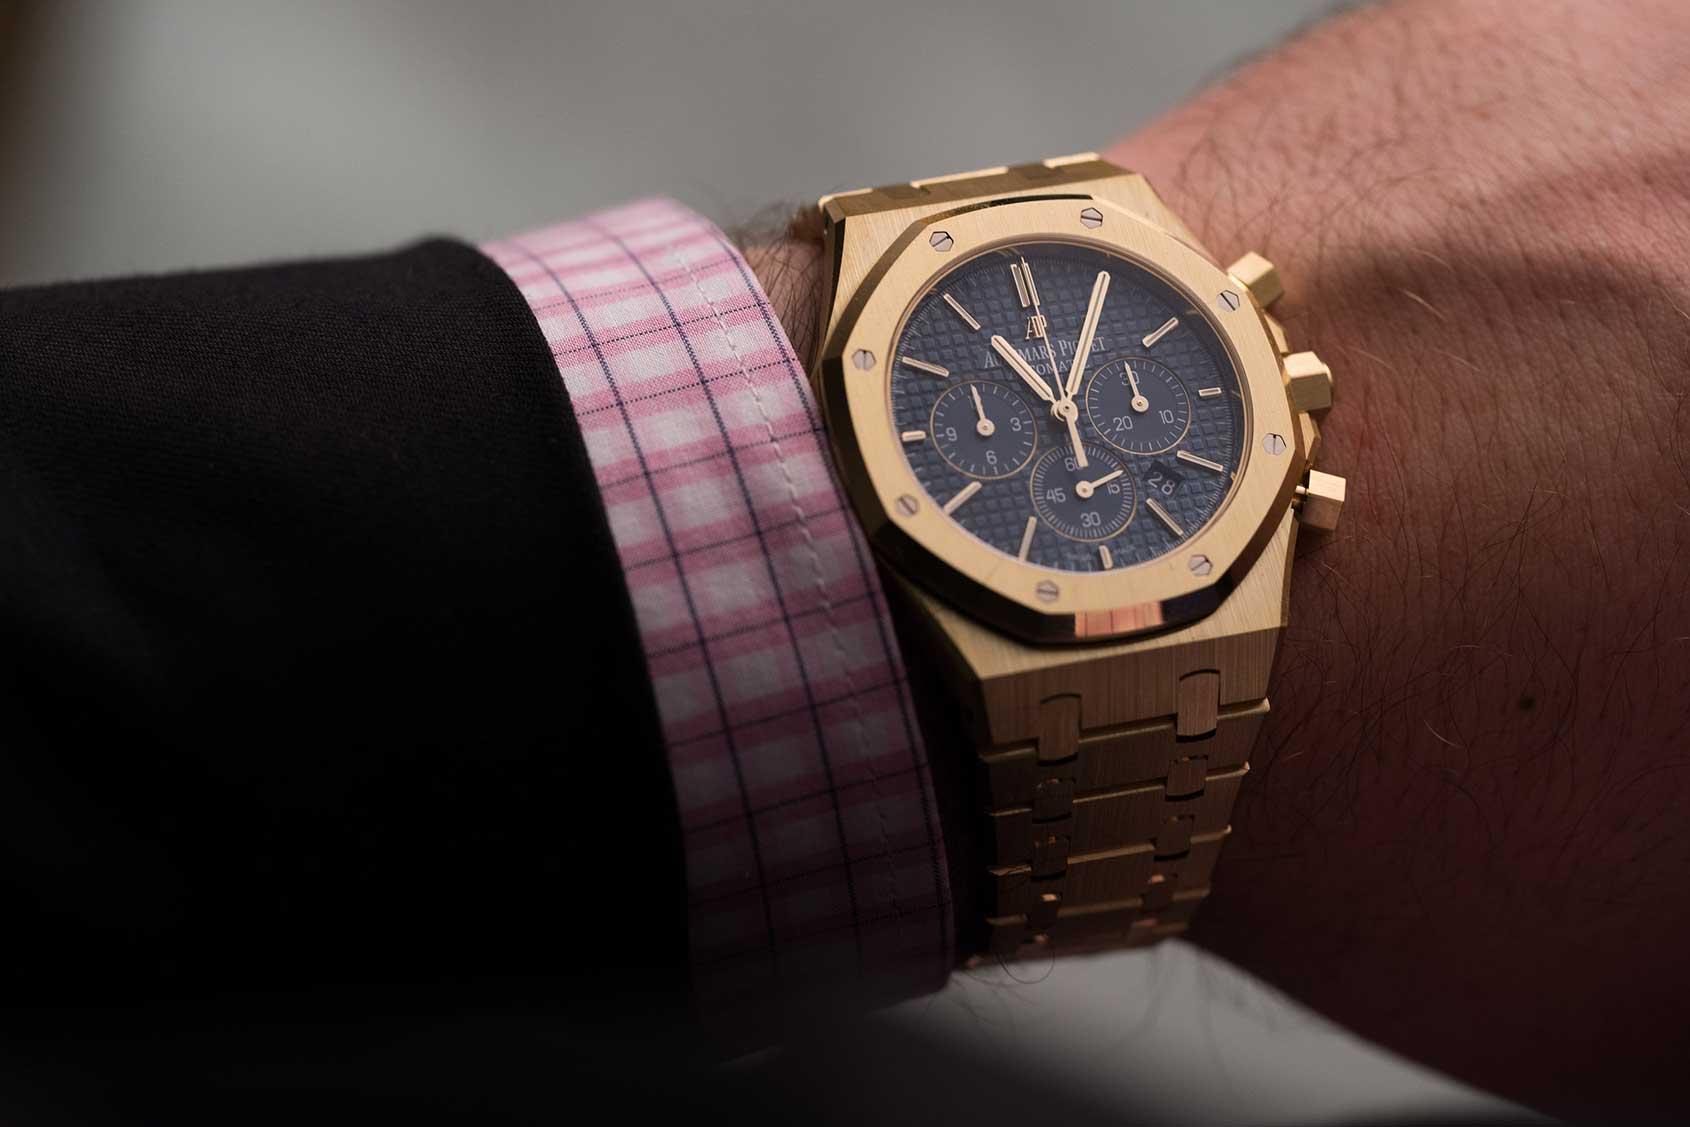 a0fd092a5dbc Audemars Piguet Royal Oak Chronograph in Yellow Gold – Hands-on Review